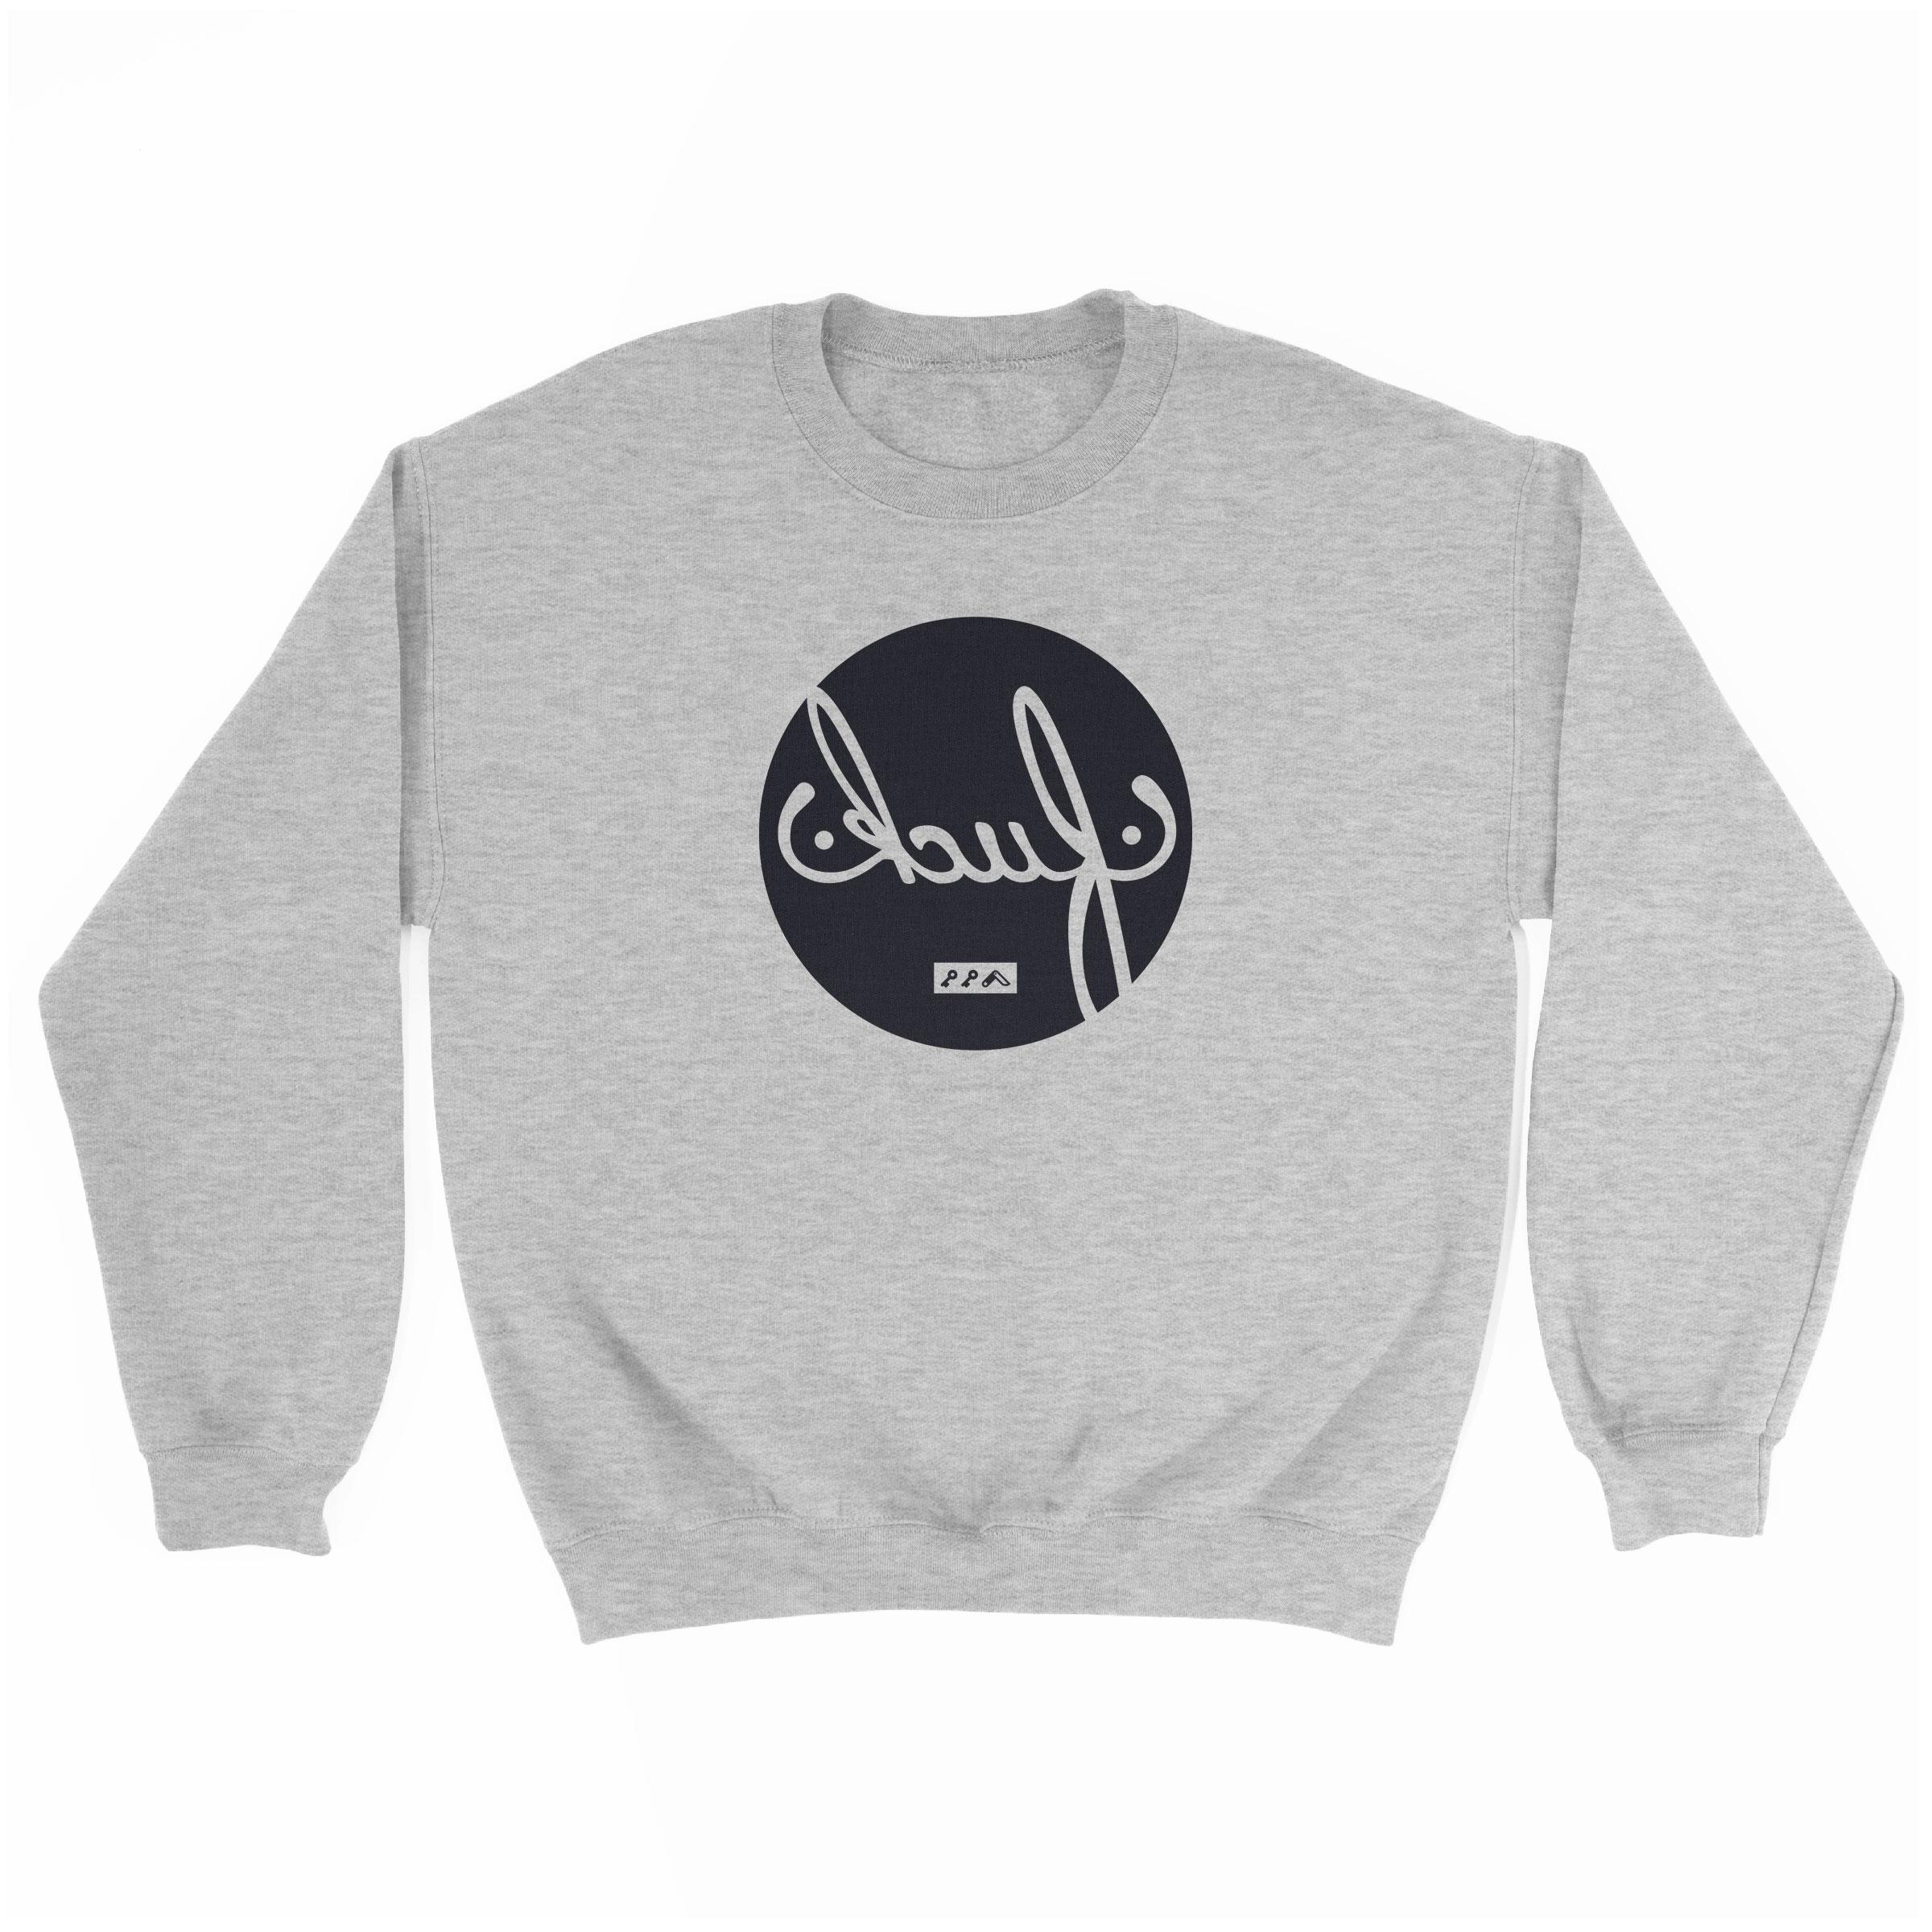 i give zero fucks sweatshirt sport grey at kikicutt.com